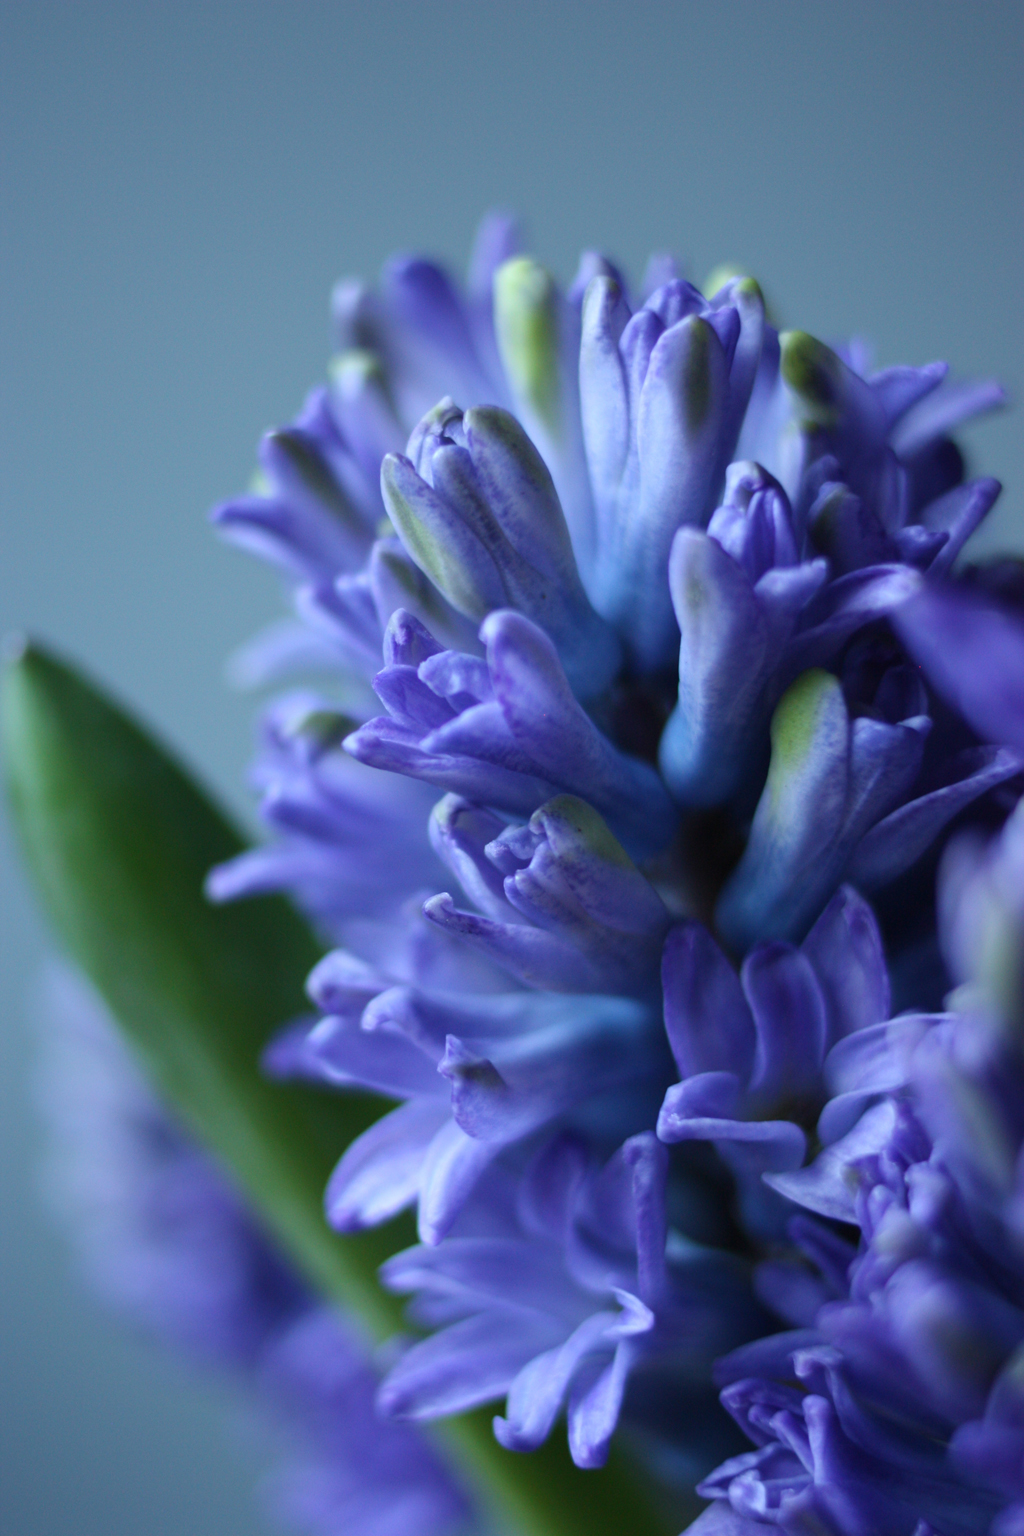 2 flower girls - hyacinths close up